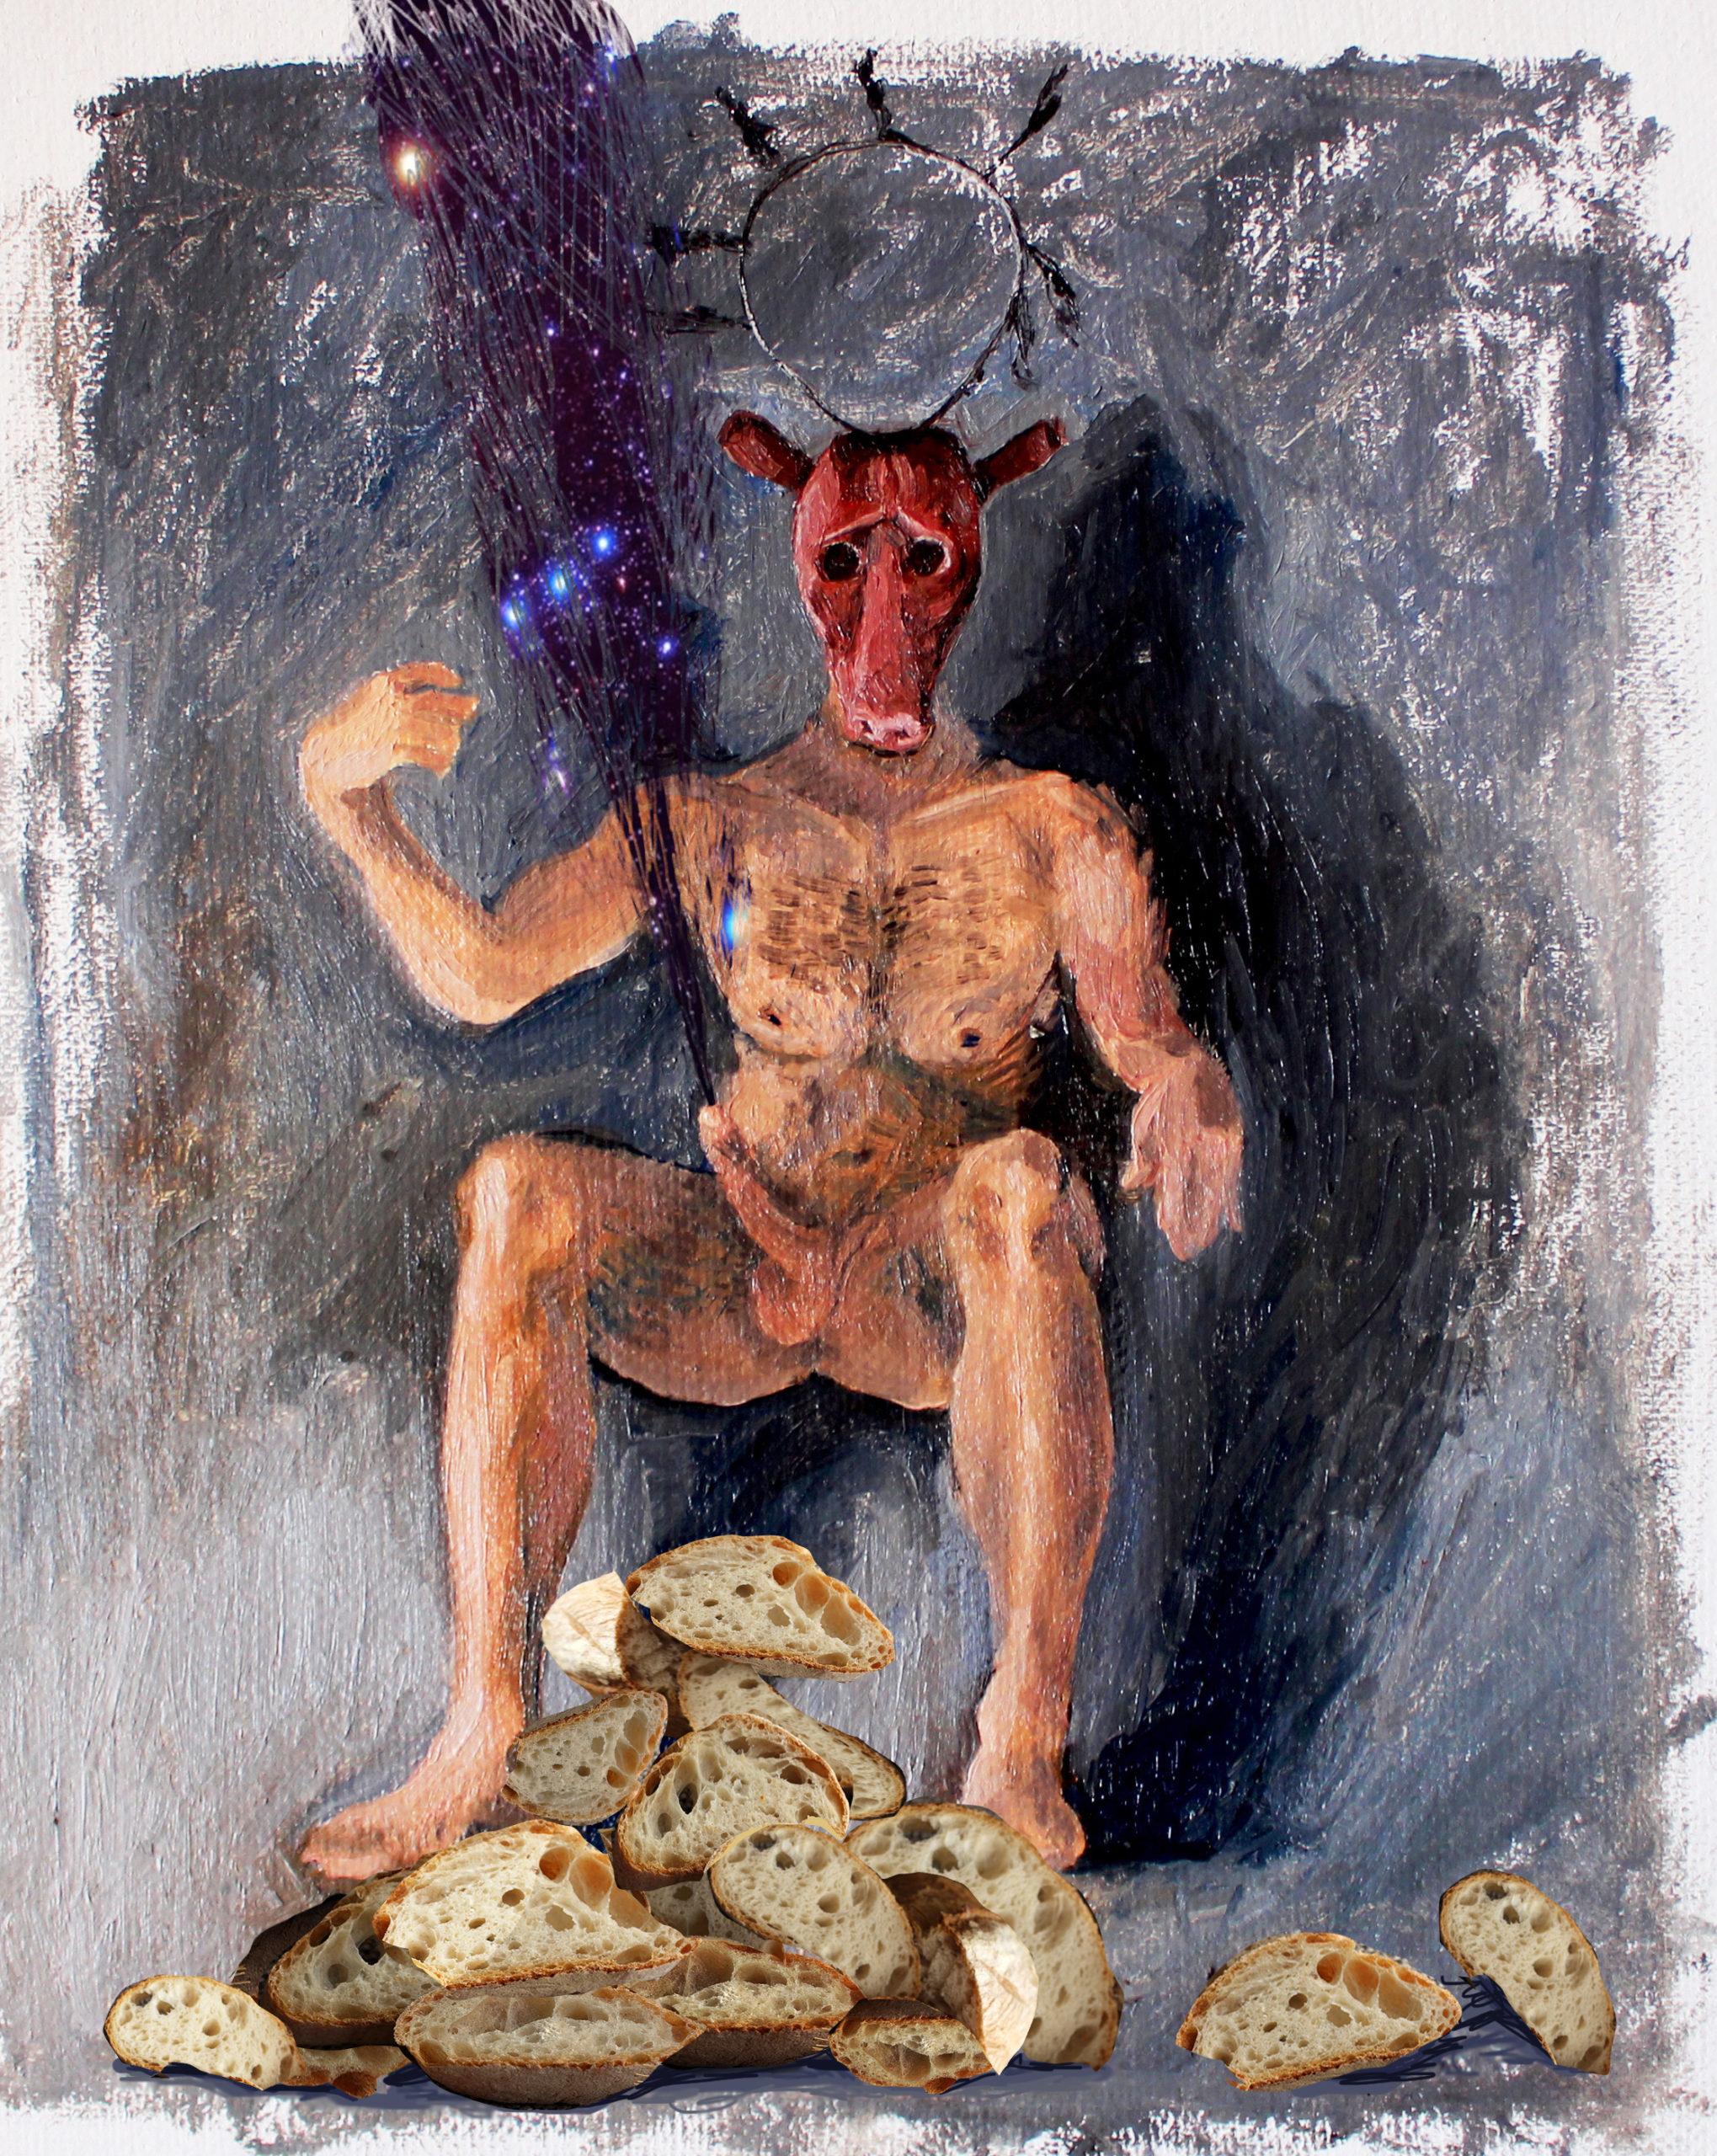 digital intervention Bacco Artolini painting universe